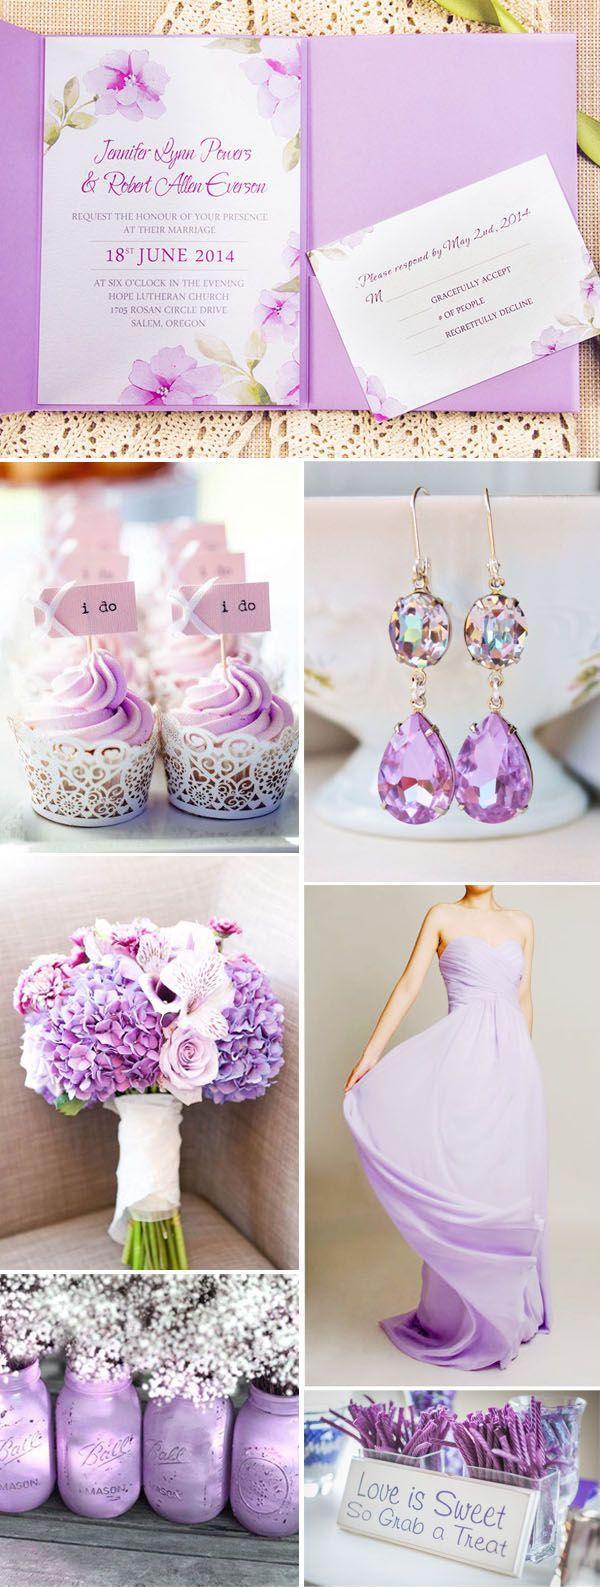 Purple Wedding Invitation Kits Exquisite Watercolor Flower Lace Pocket Wedding Invitation Kits